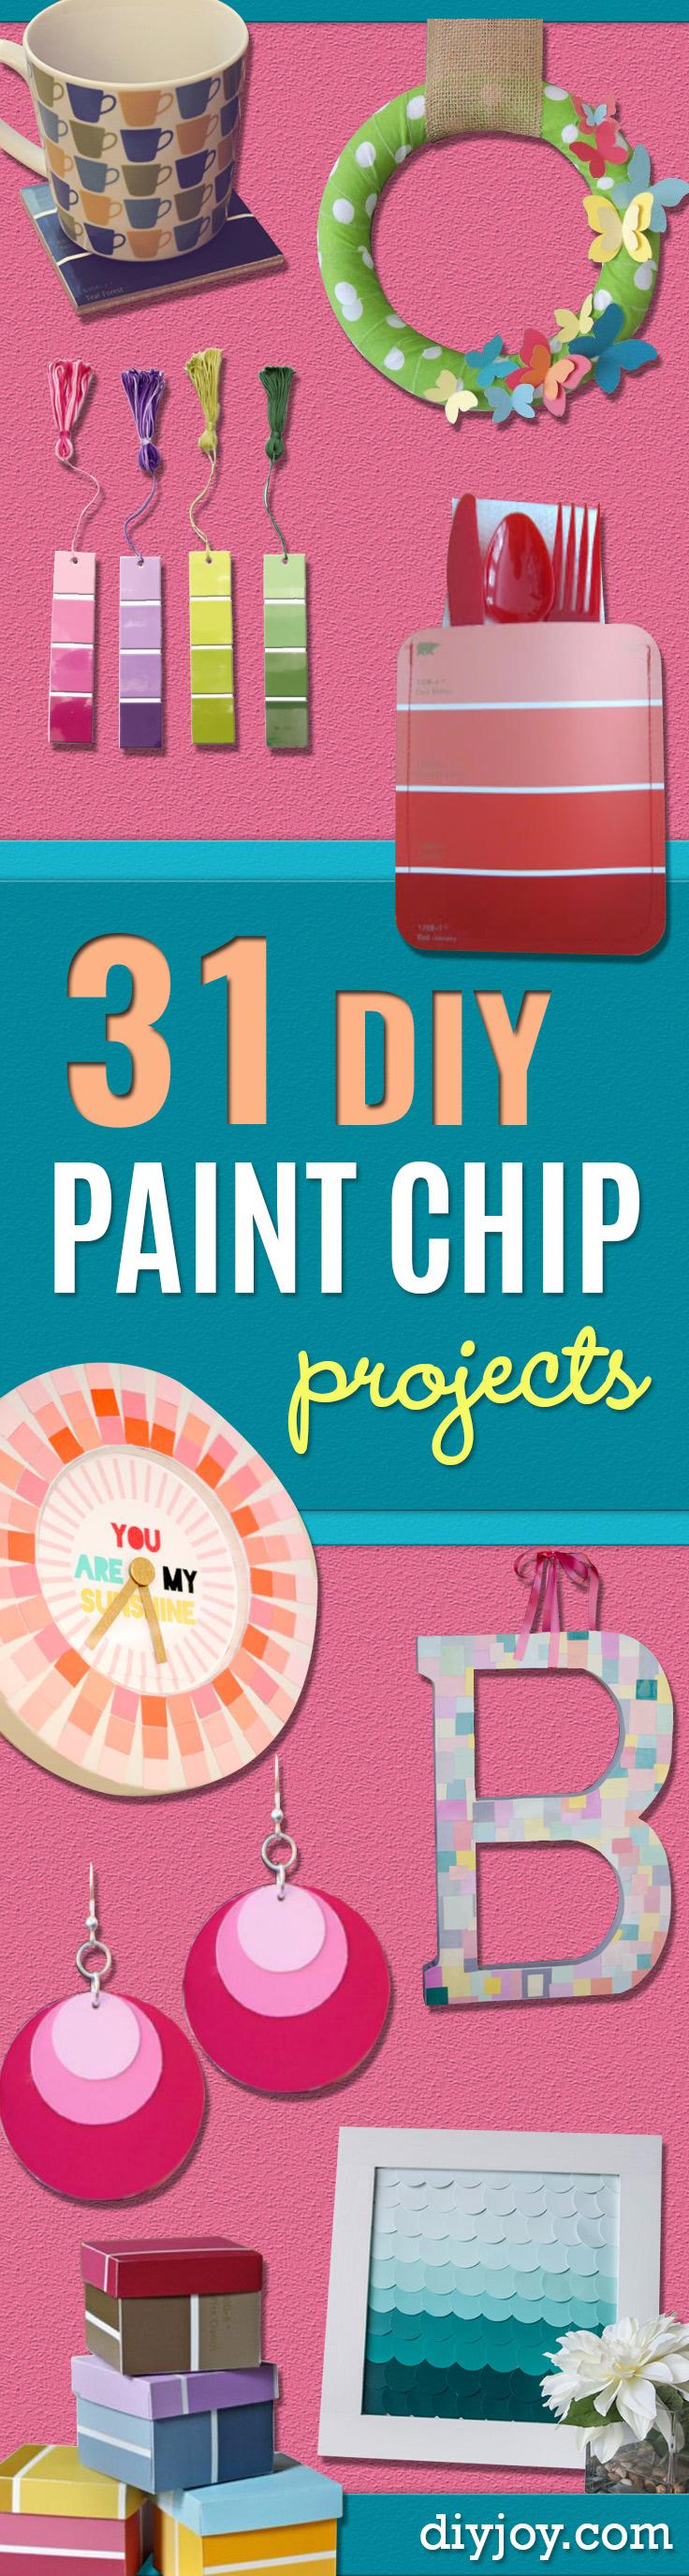 31 Super Creative Diy Paint Chip Projects